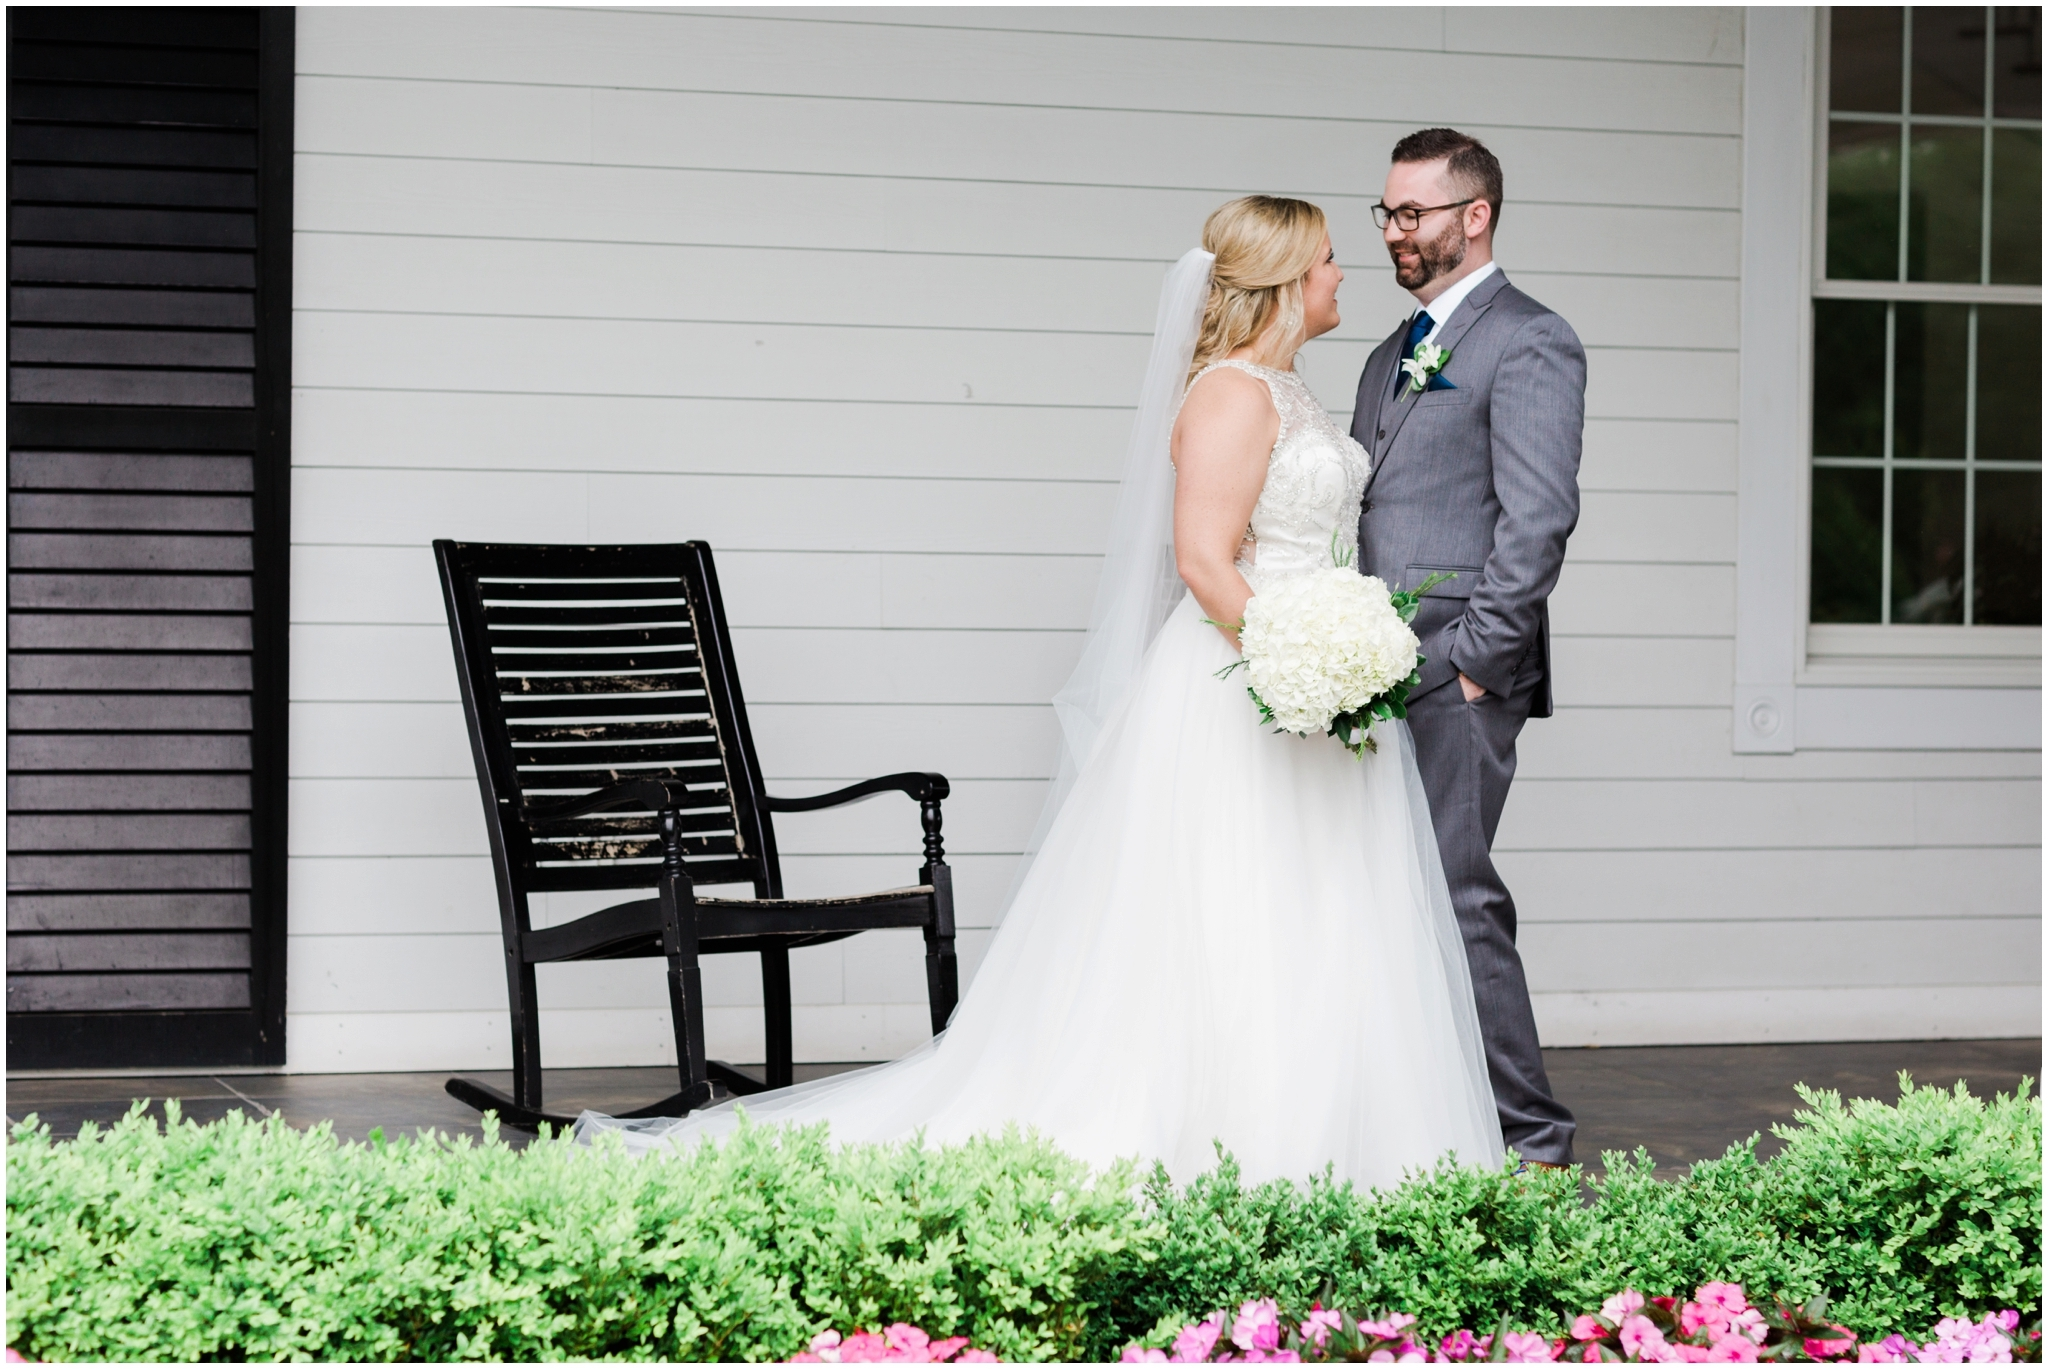 caitlin elizabeth james-elizabeth friske photography-selecting a wedding venue